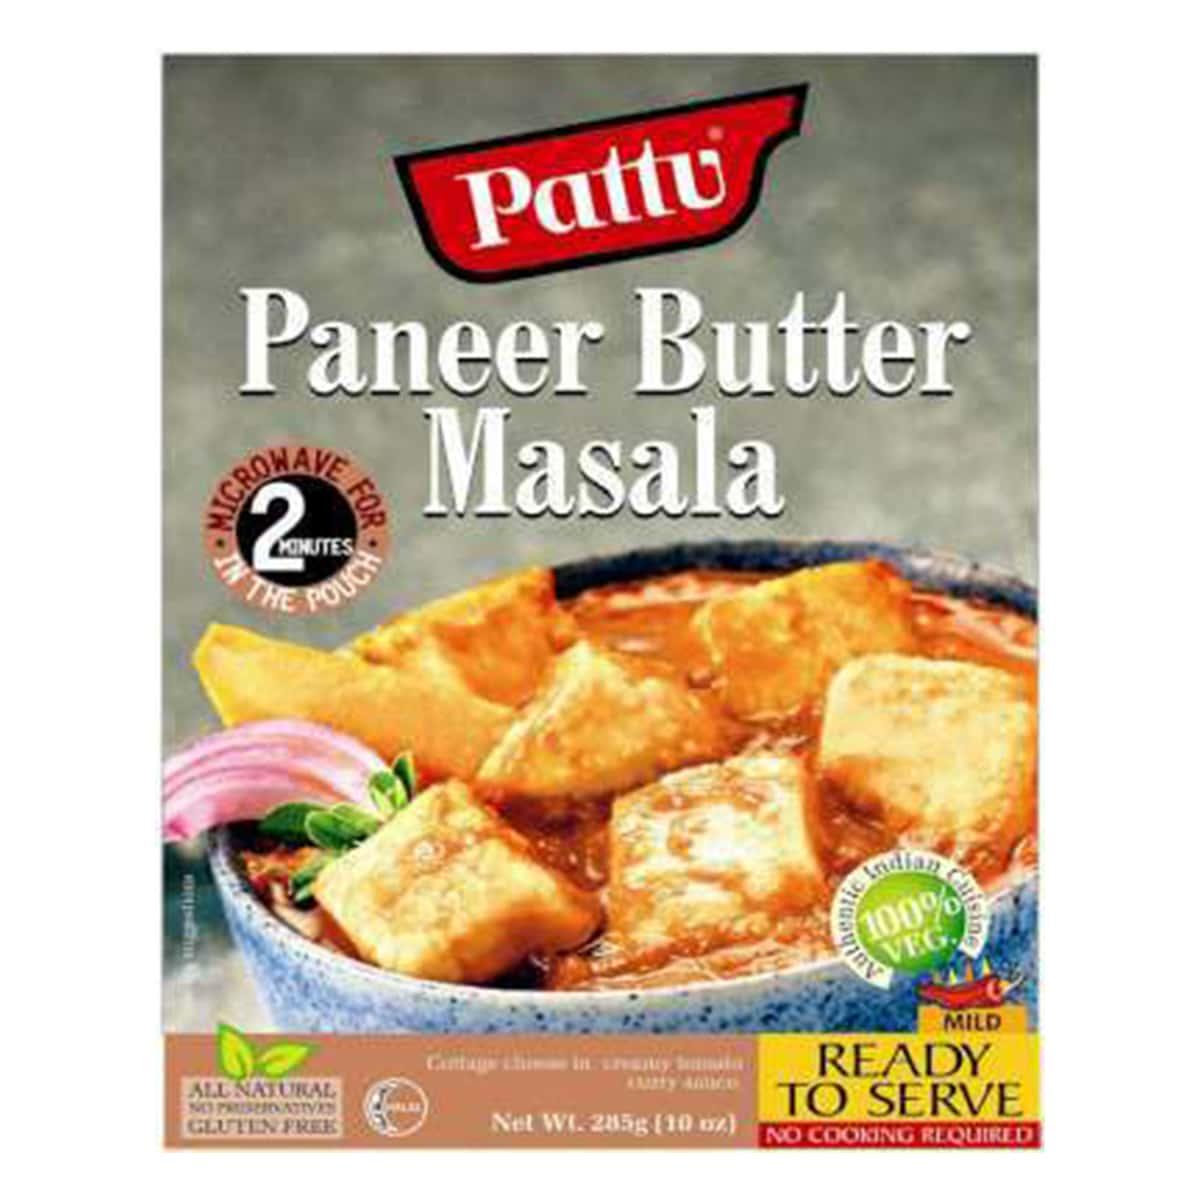 Buy Pattu Paneer Butter Masala Ready to Serve - 285 gm